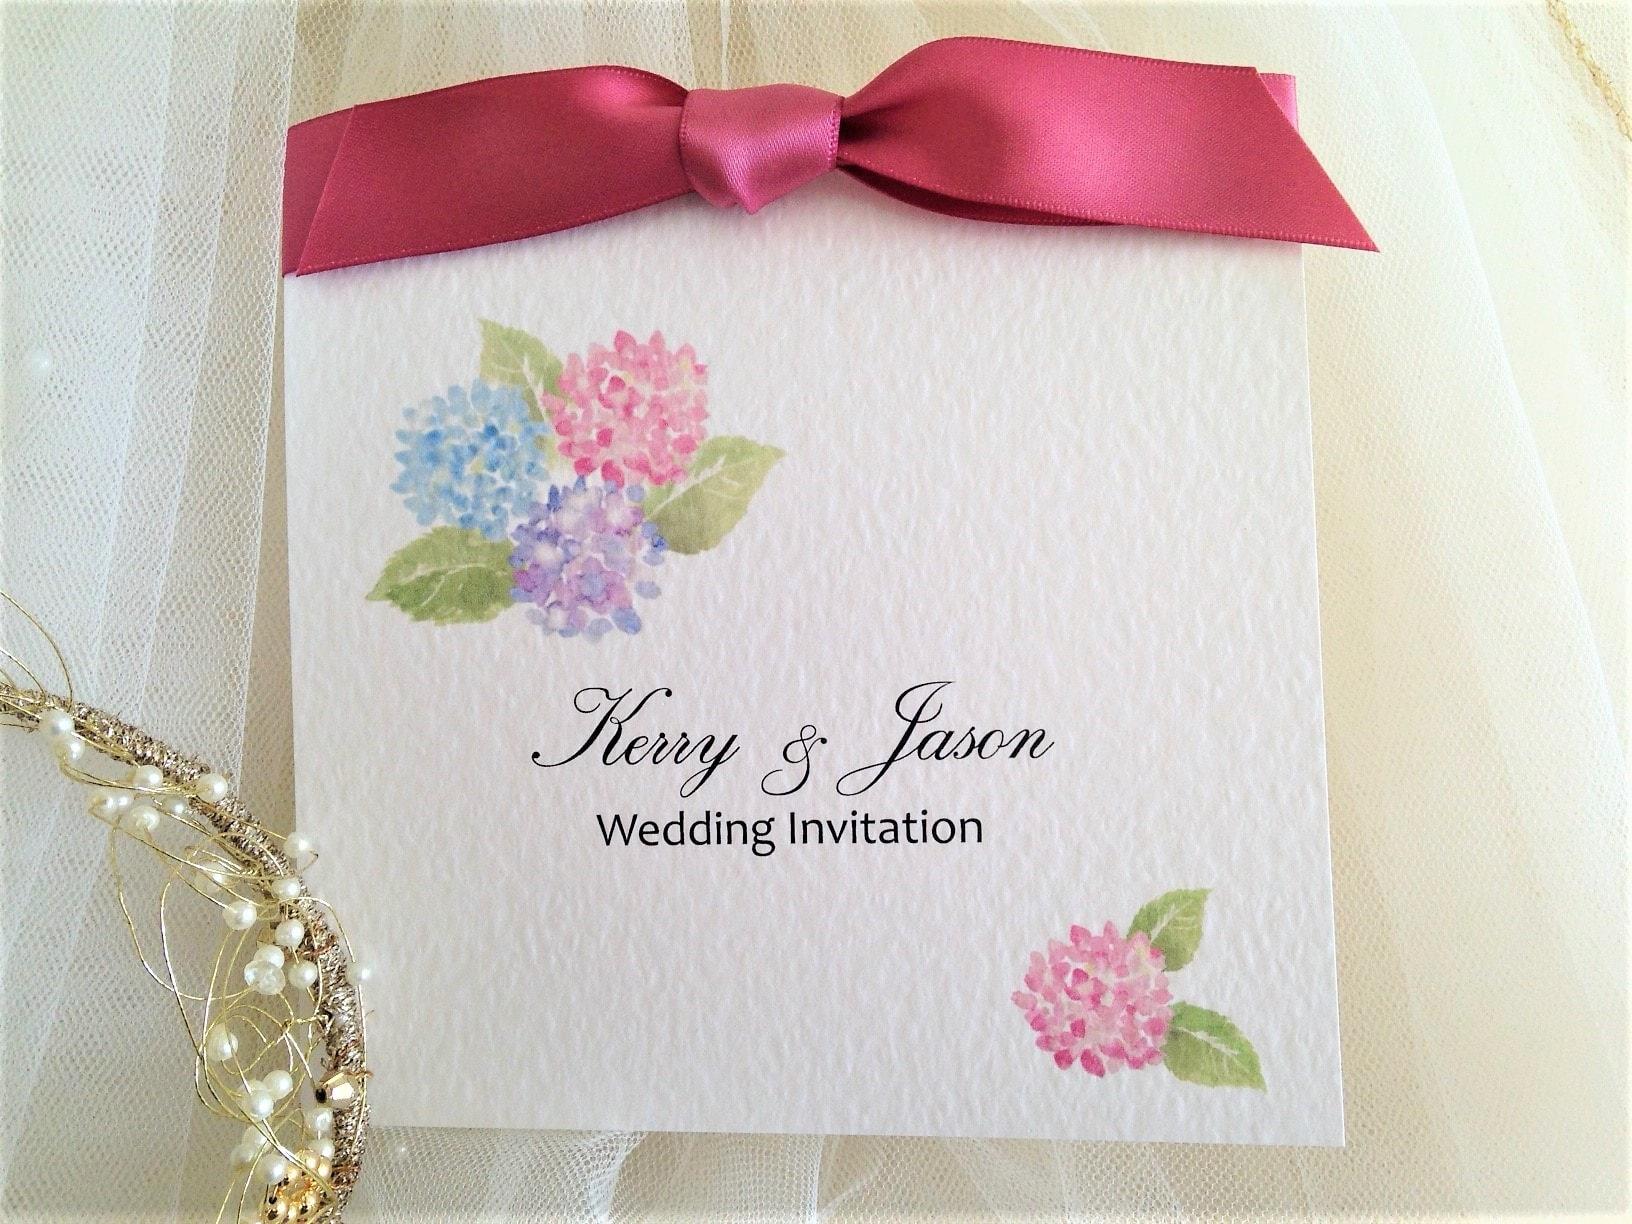 Hyrdangea Wedding Invitations with Blush Ribbon - Daisy Chain Invites